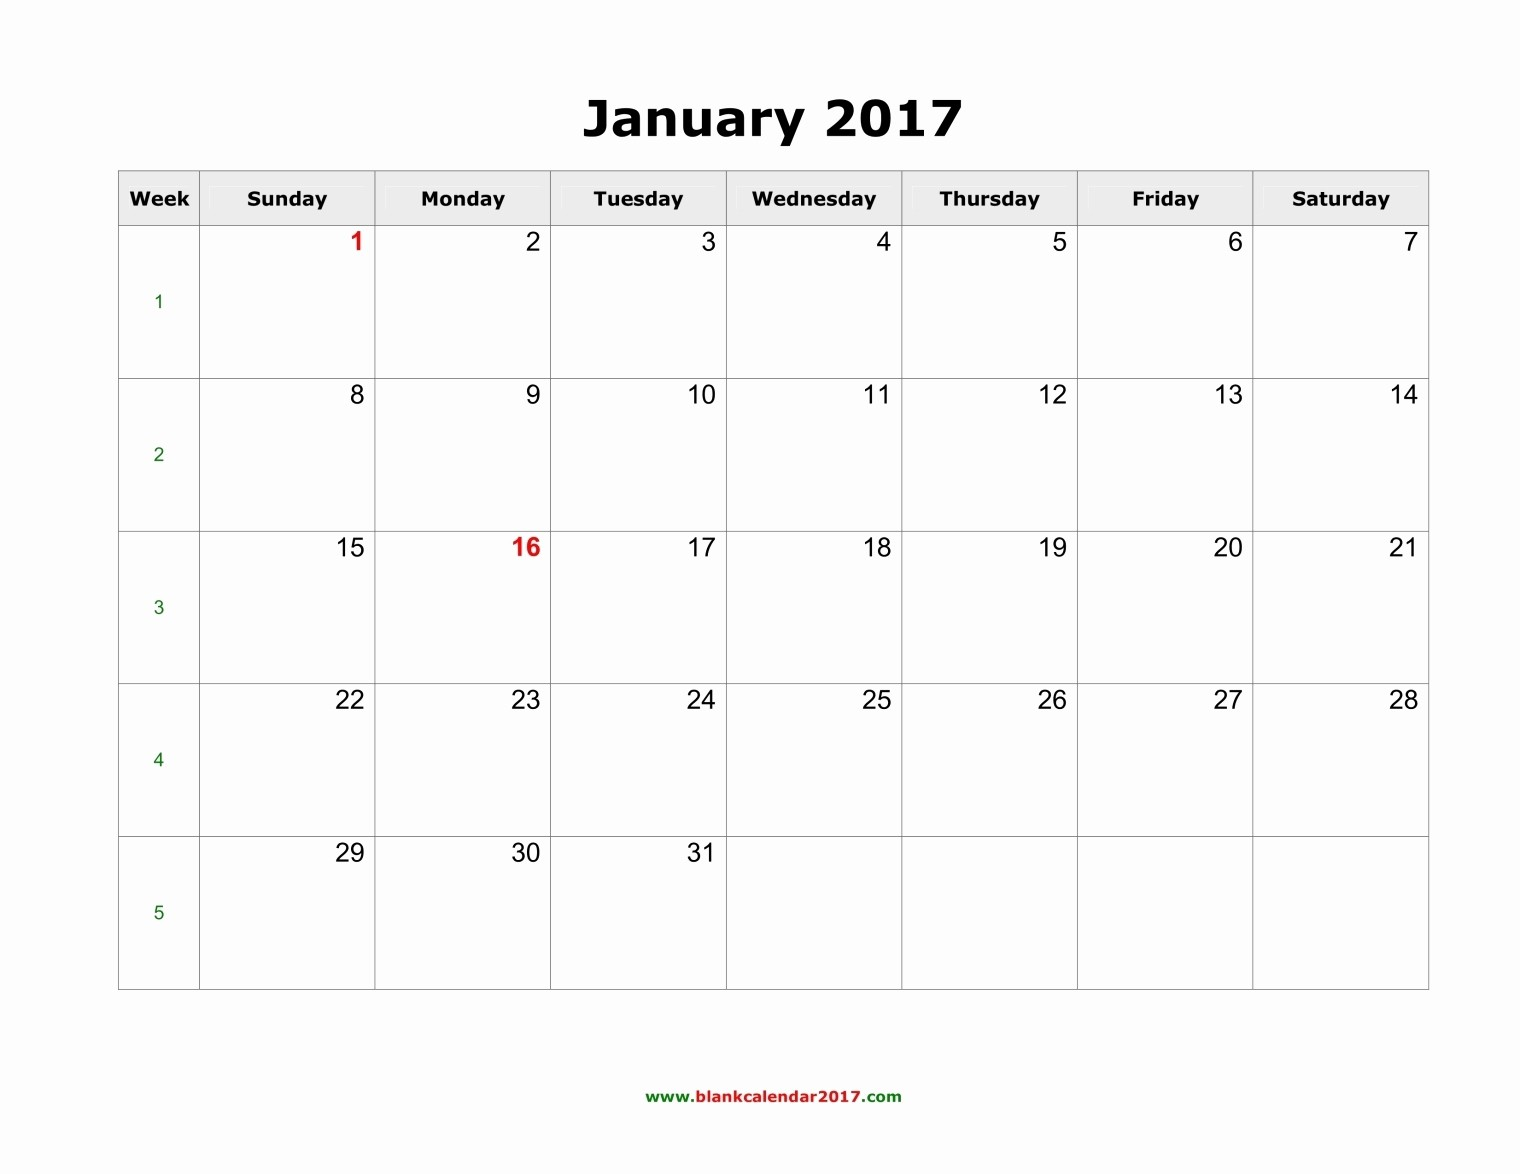 Free Printable Weekly Calendars 2017 Lovely Blank Monthly Calendar 2017